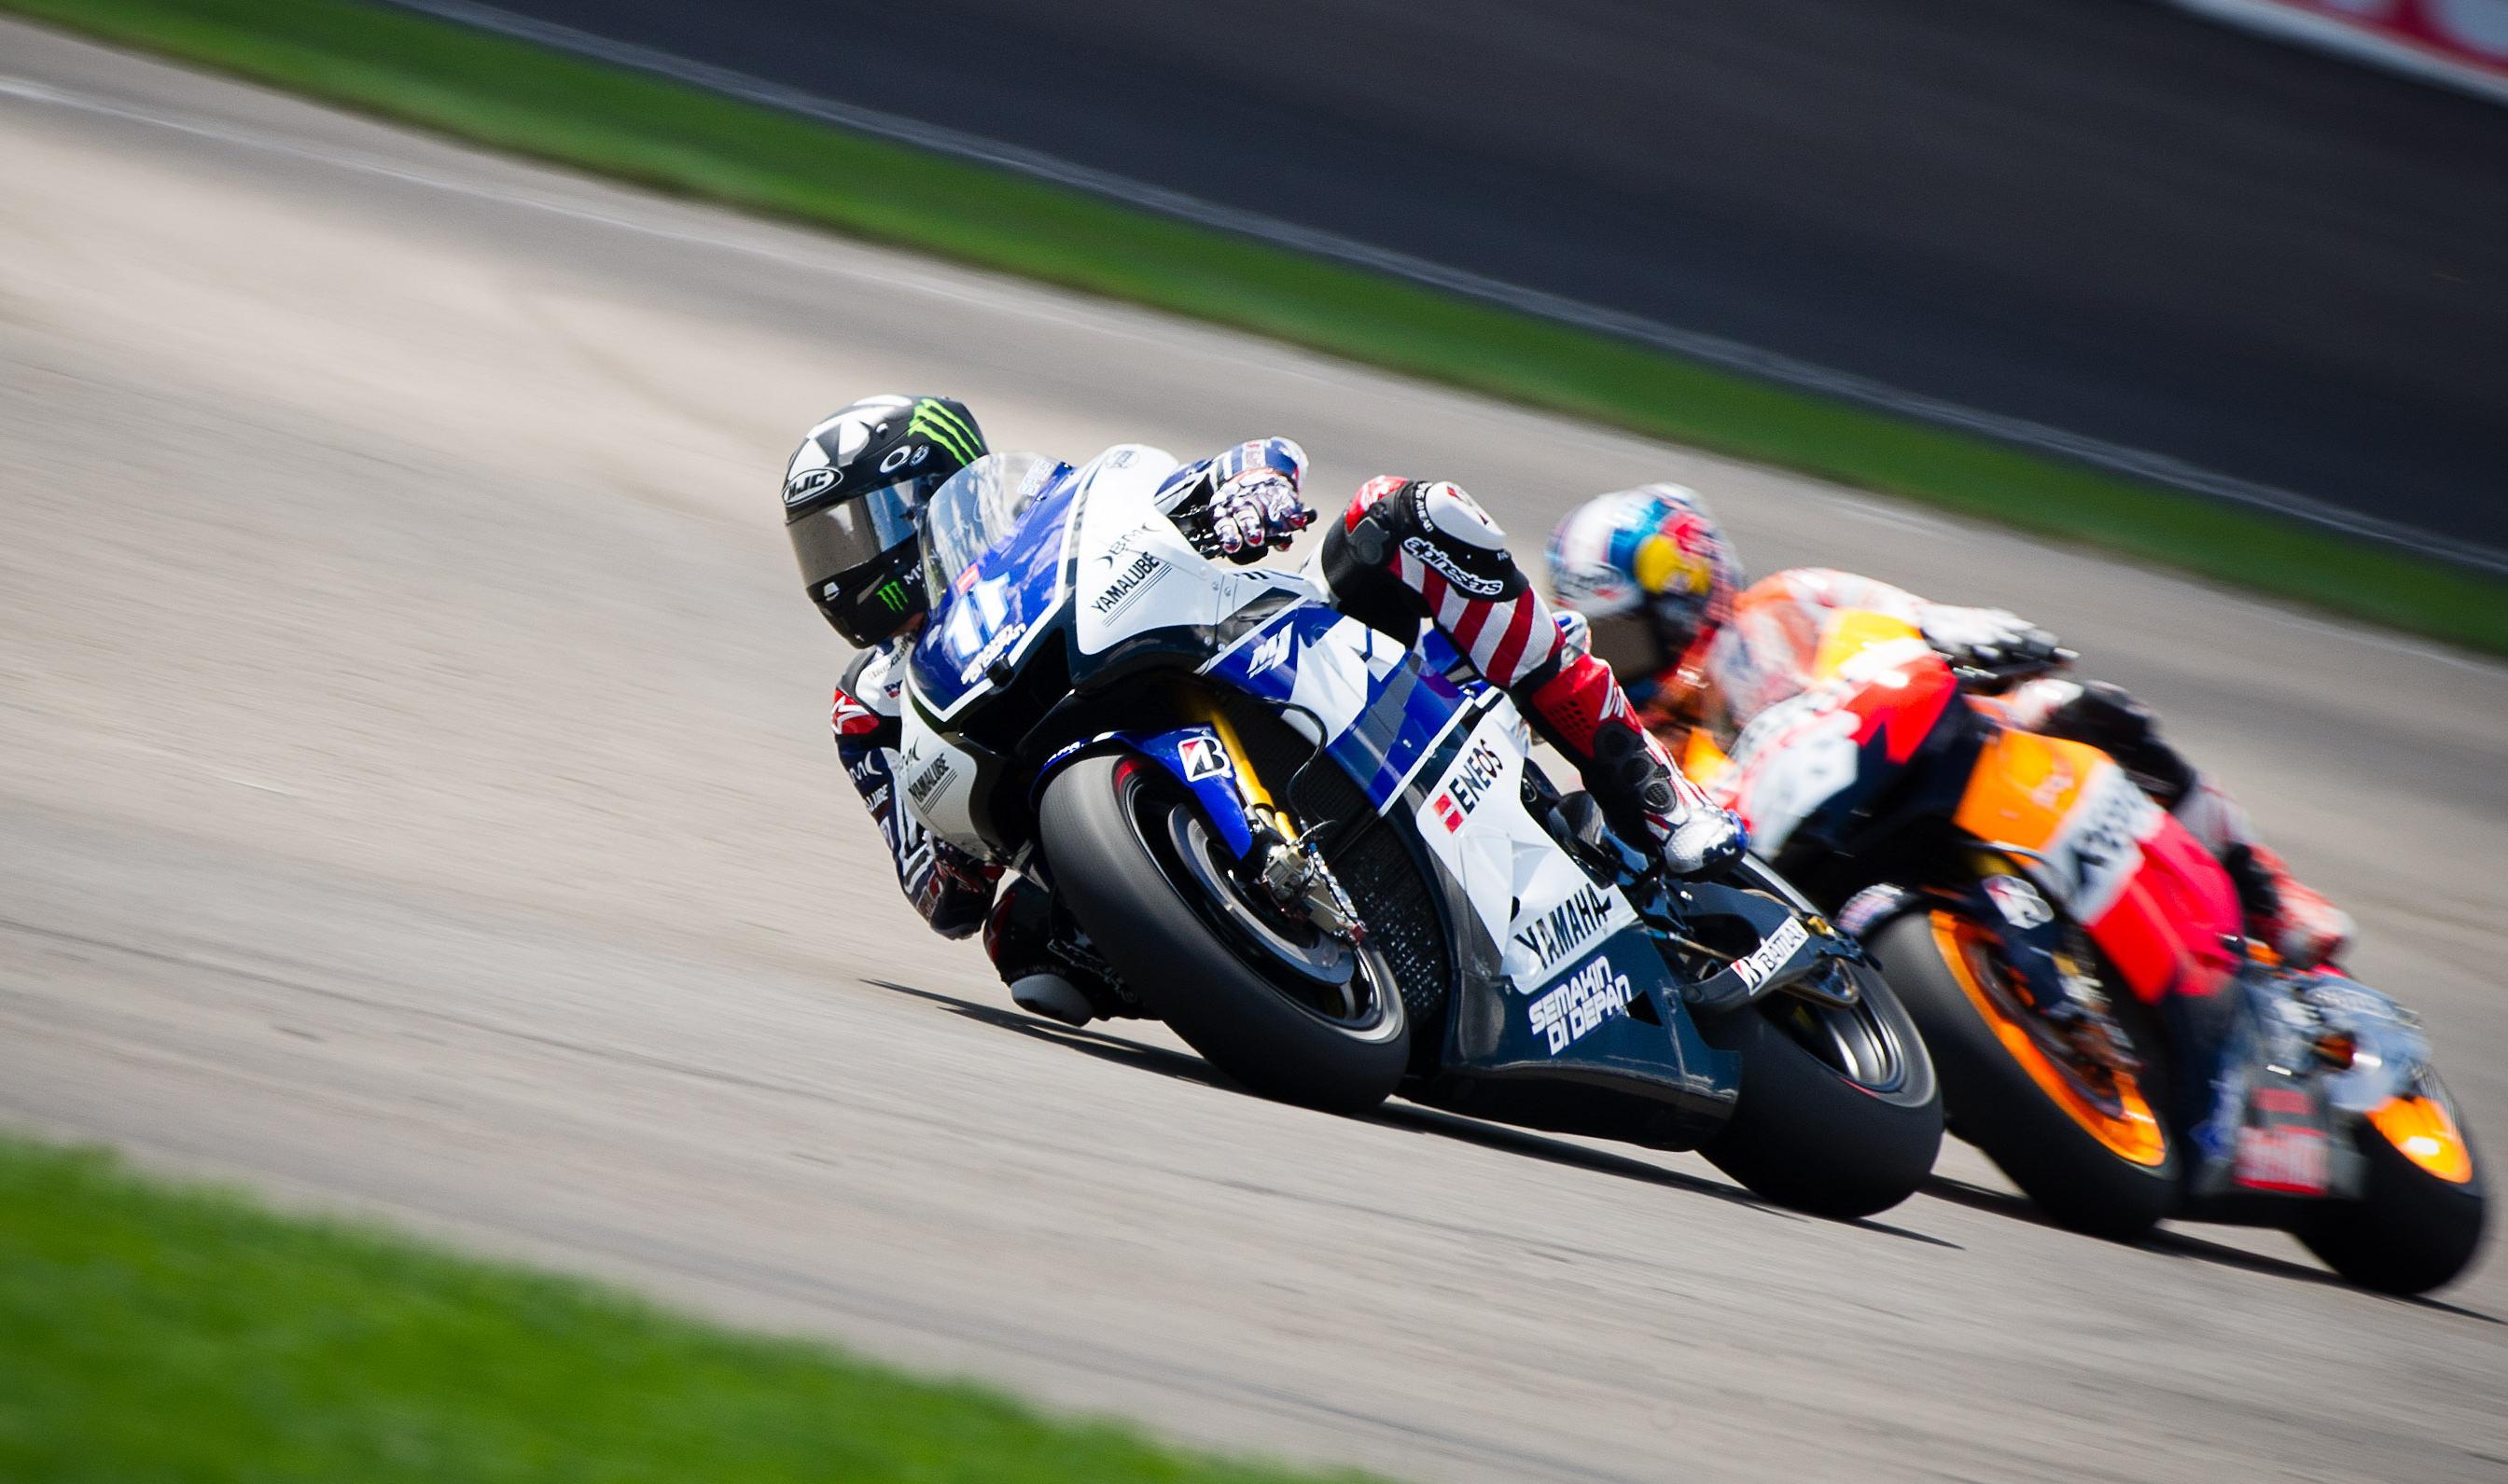 Motorcycle Yamaha Motogp Race Racing Wallpaper 2688x1591 112894